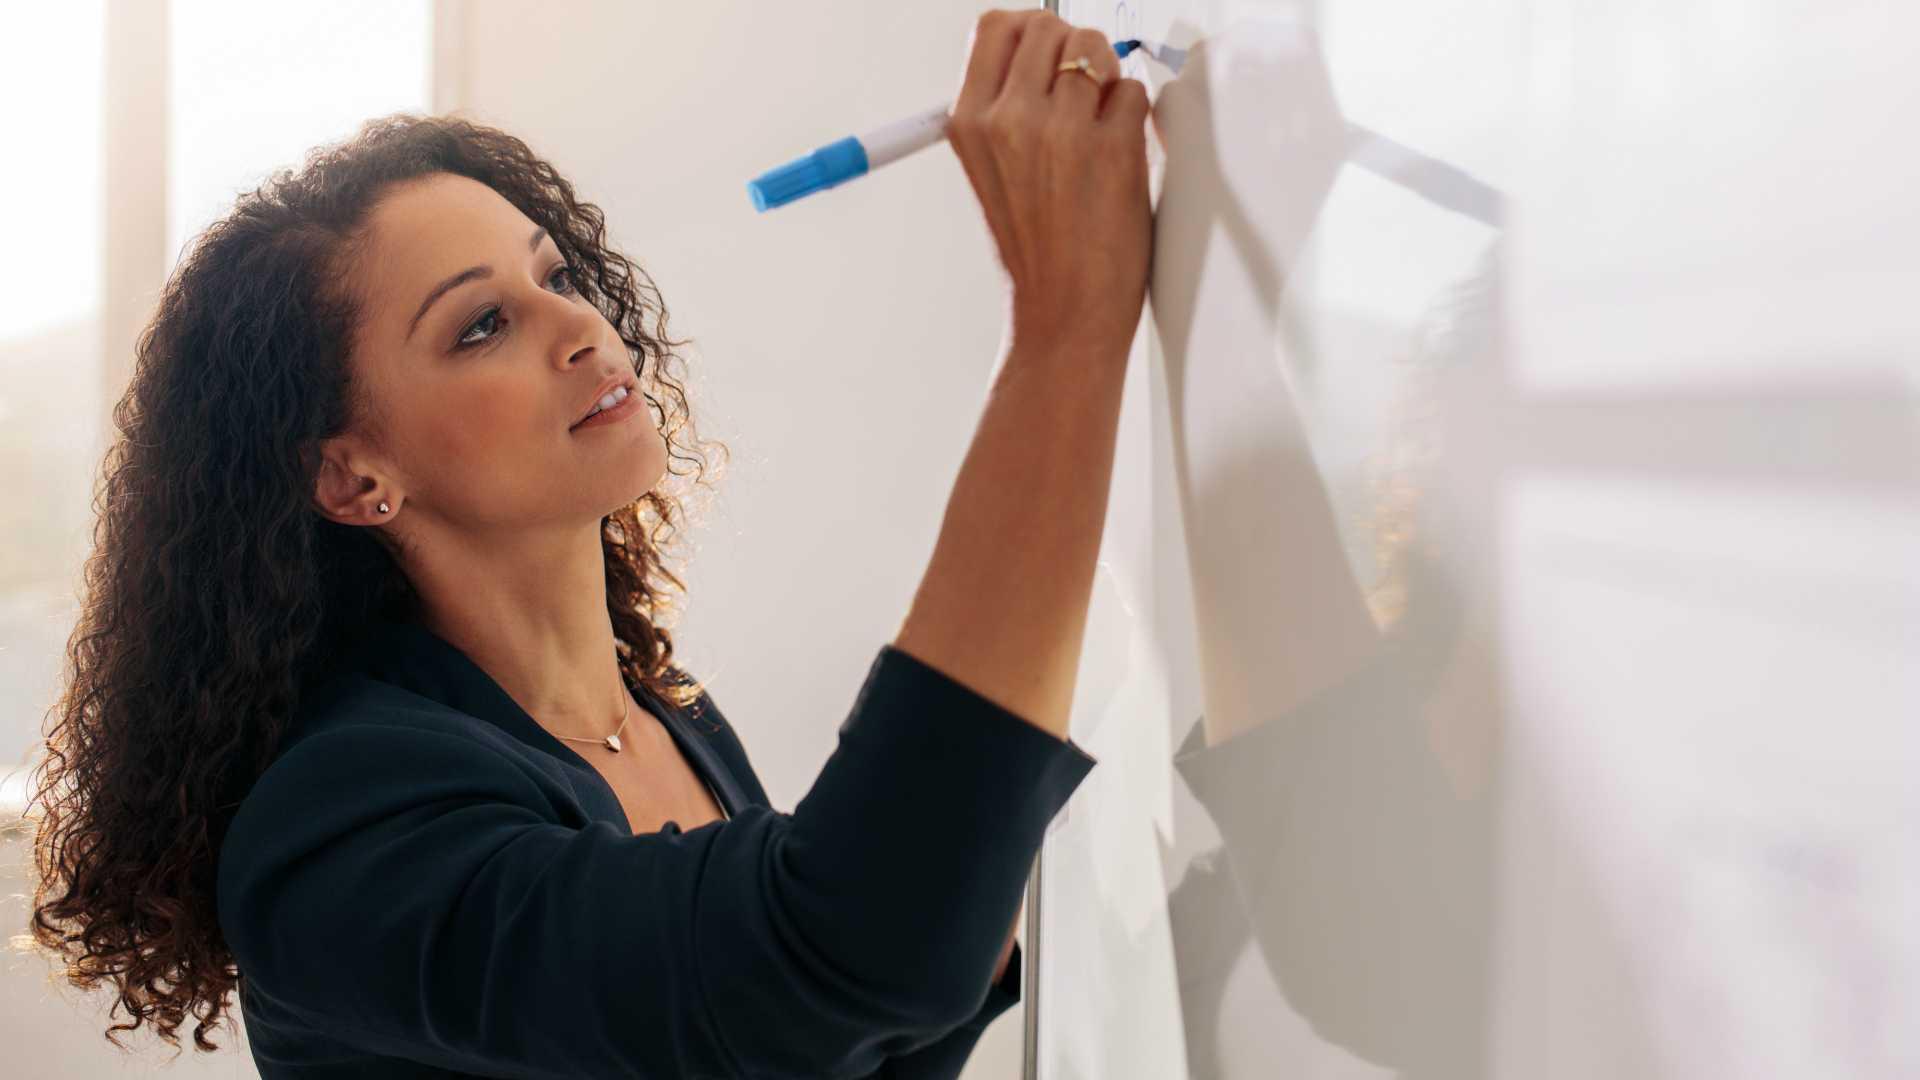 5 Training Mistakes That Inhibit Lasting Change - Training Industry